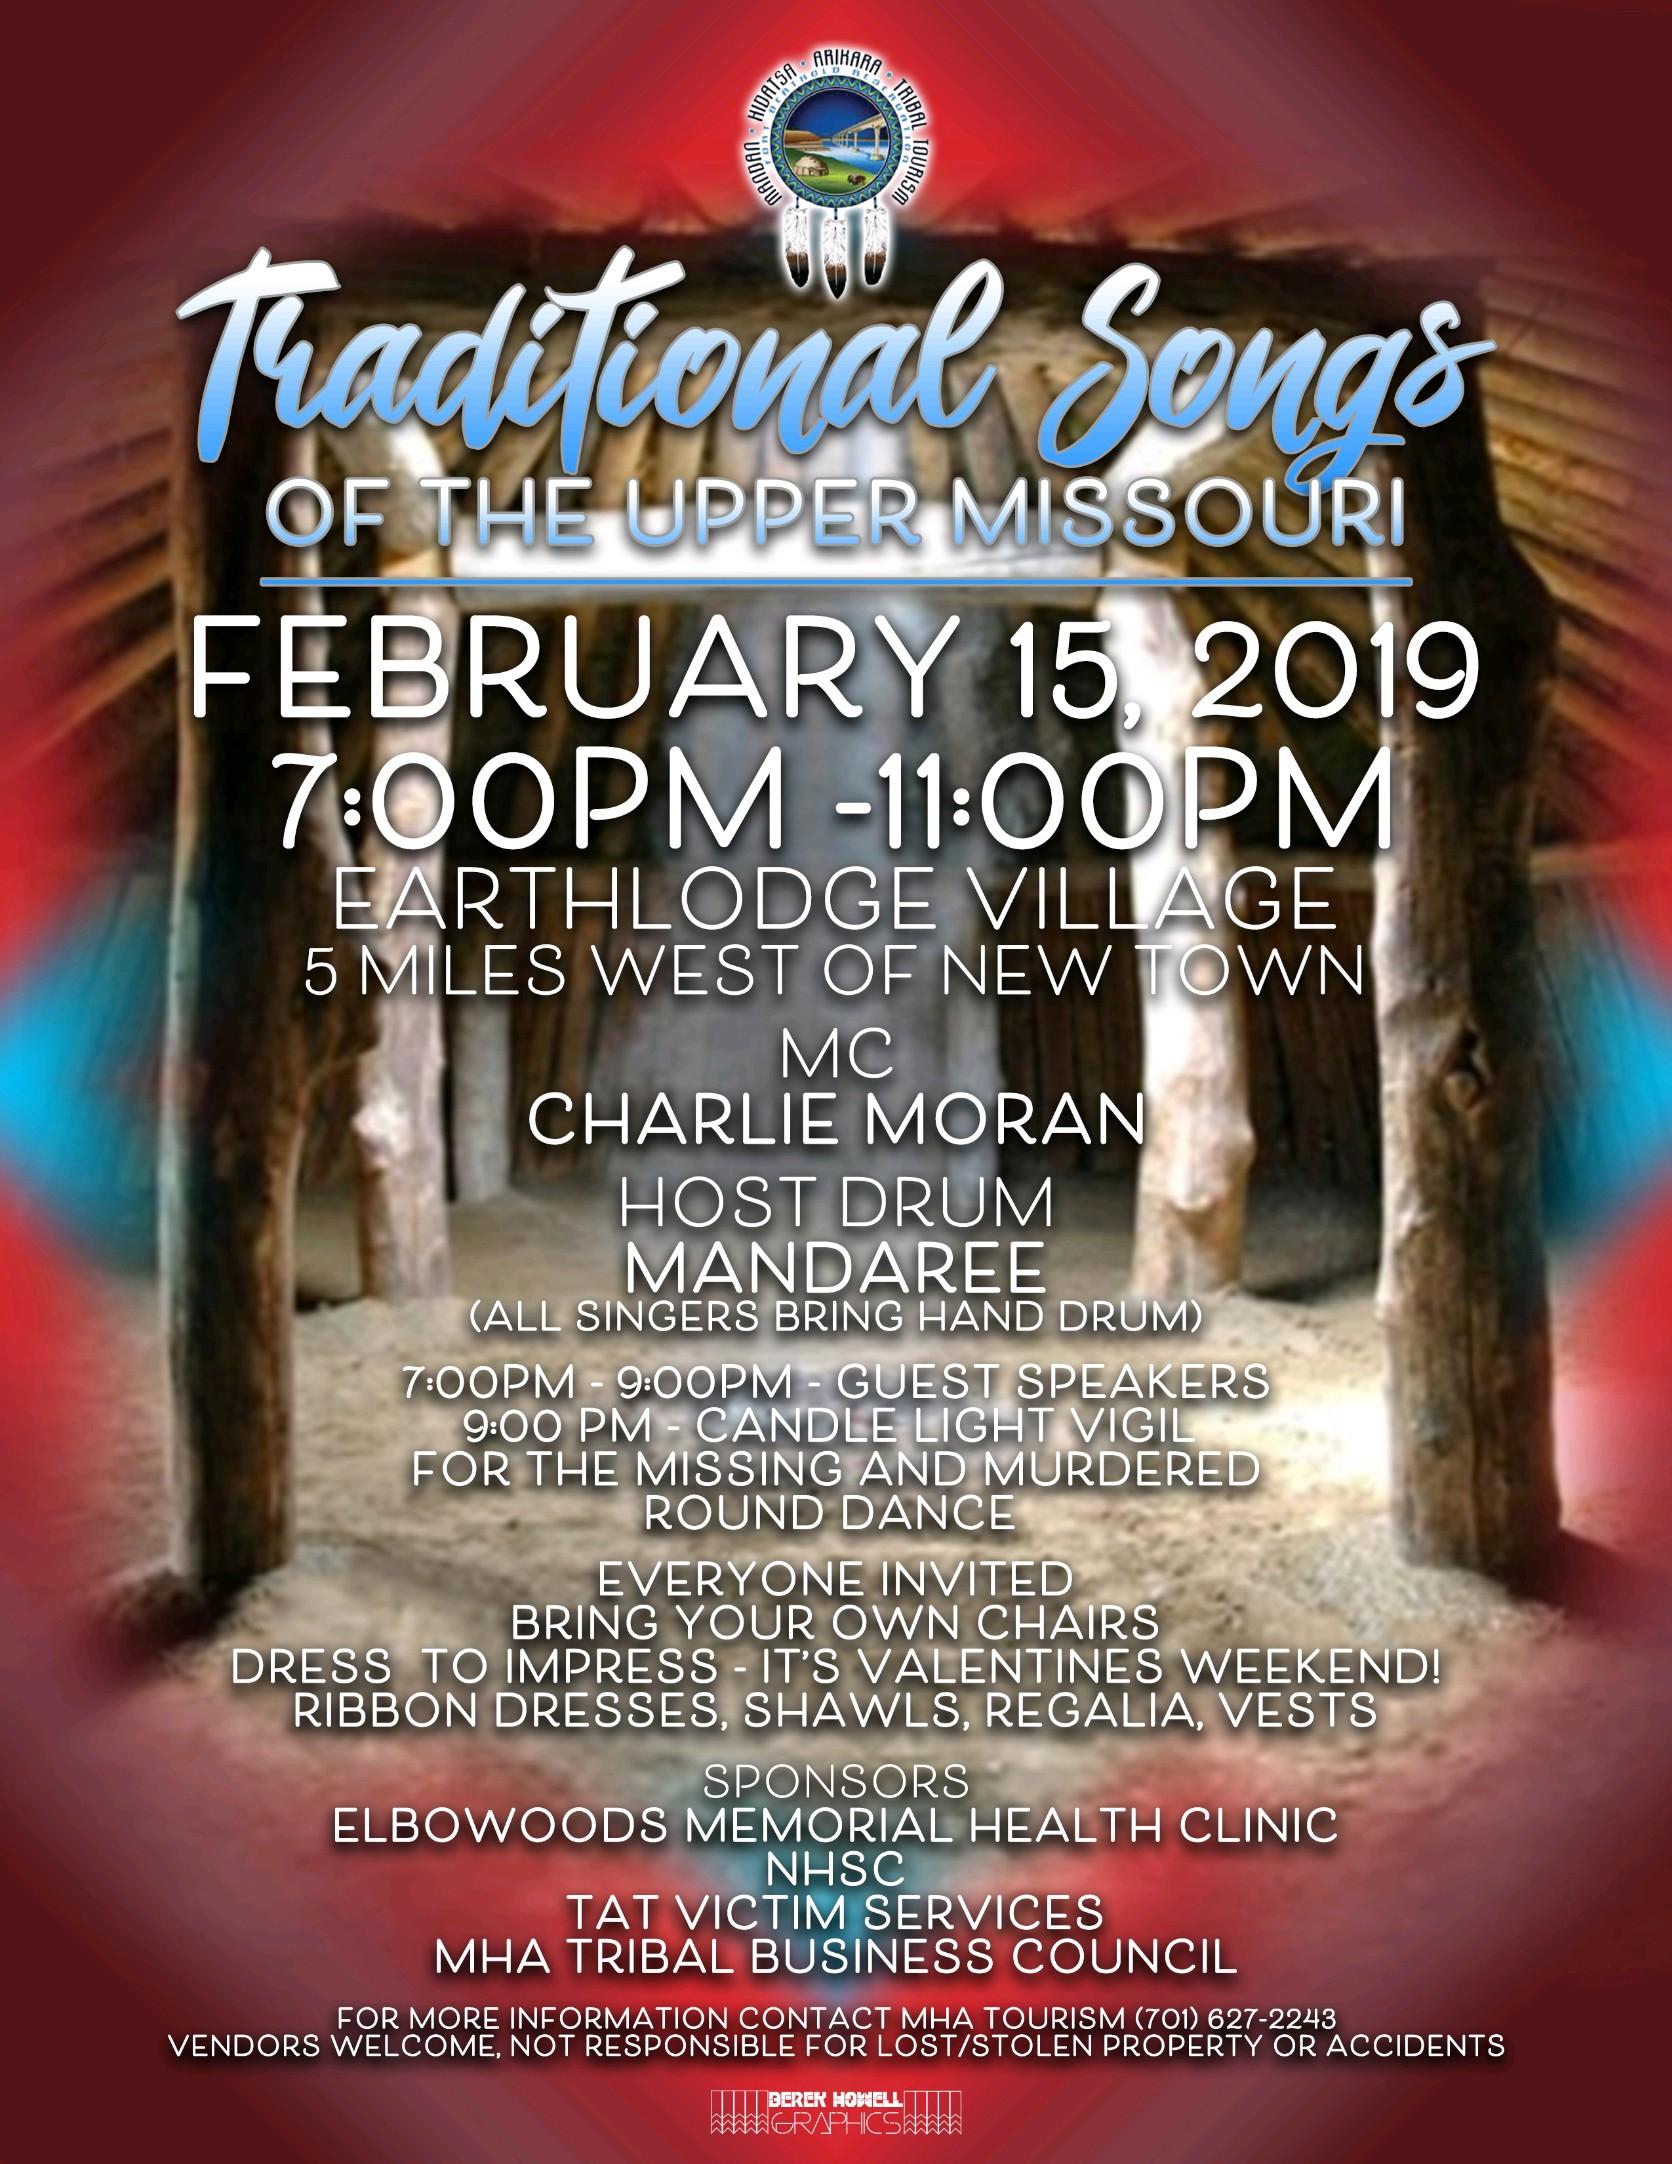 MHA Tourism Traditional Songs of the Upper Missouri Feb 15 2019_.jpg